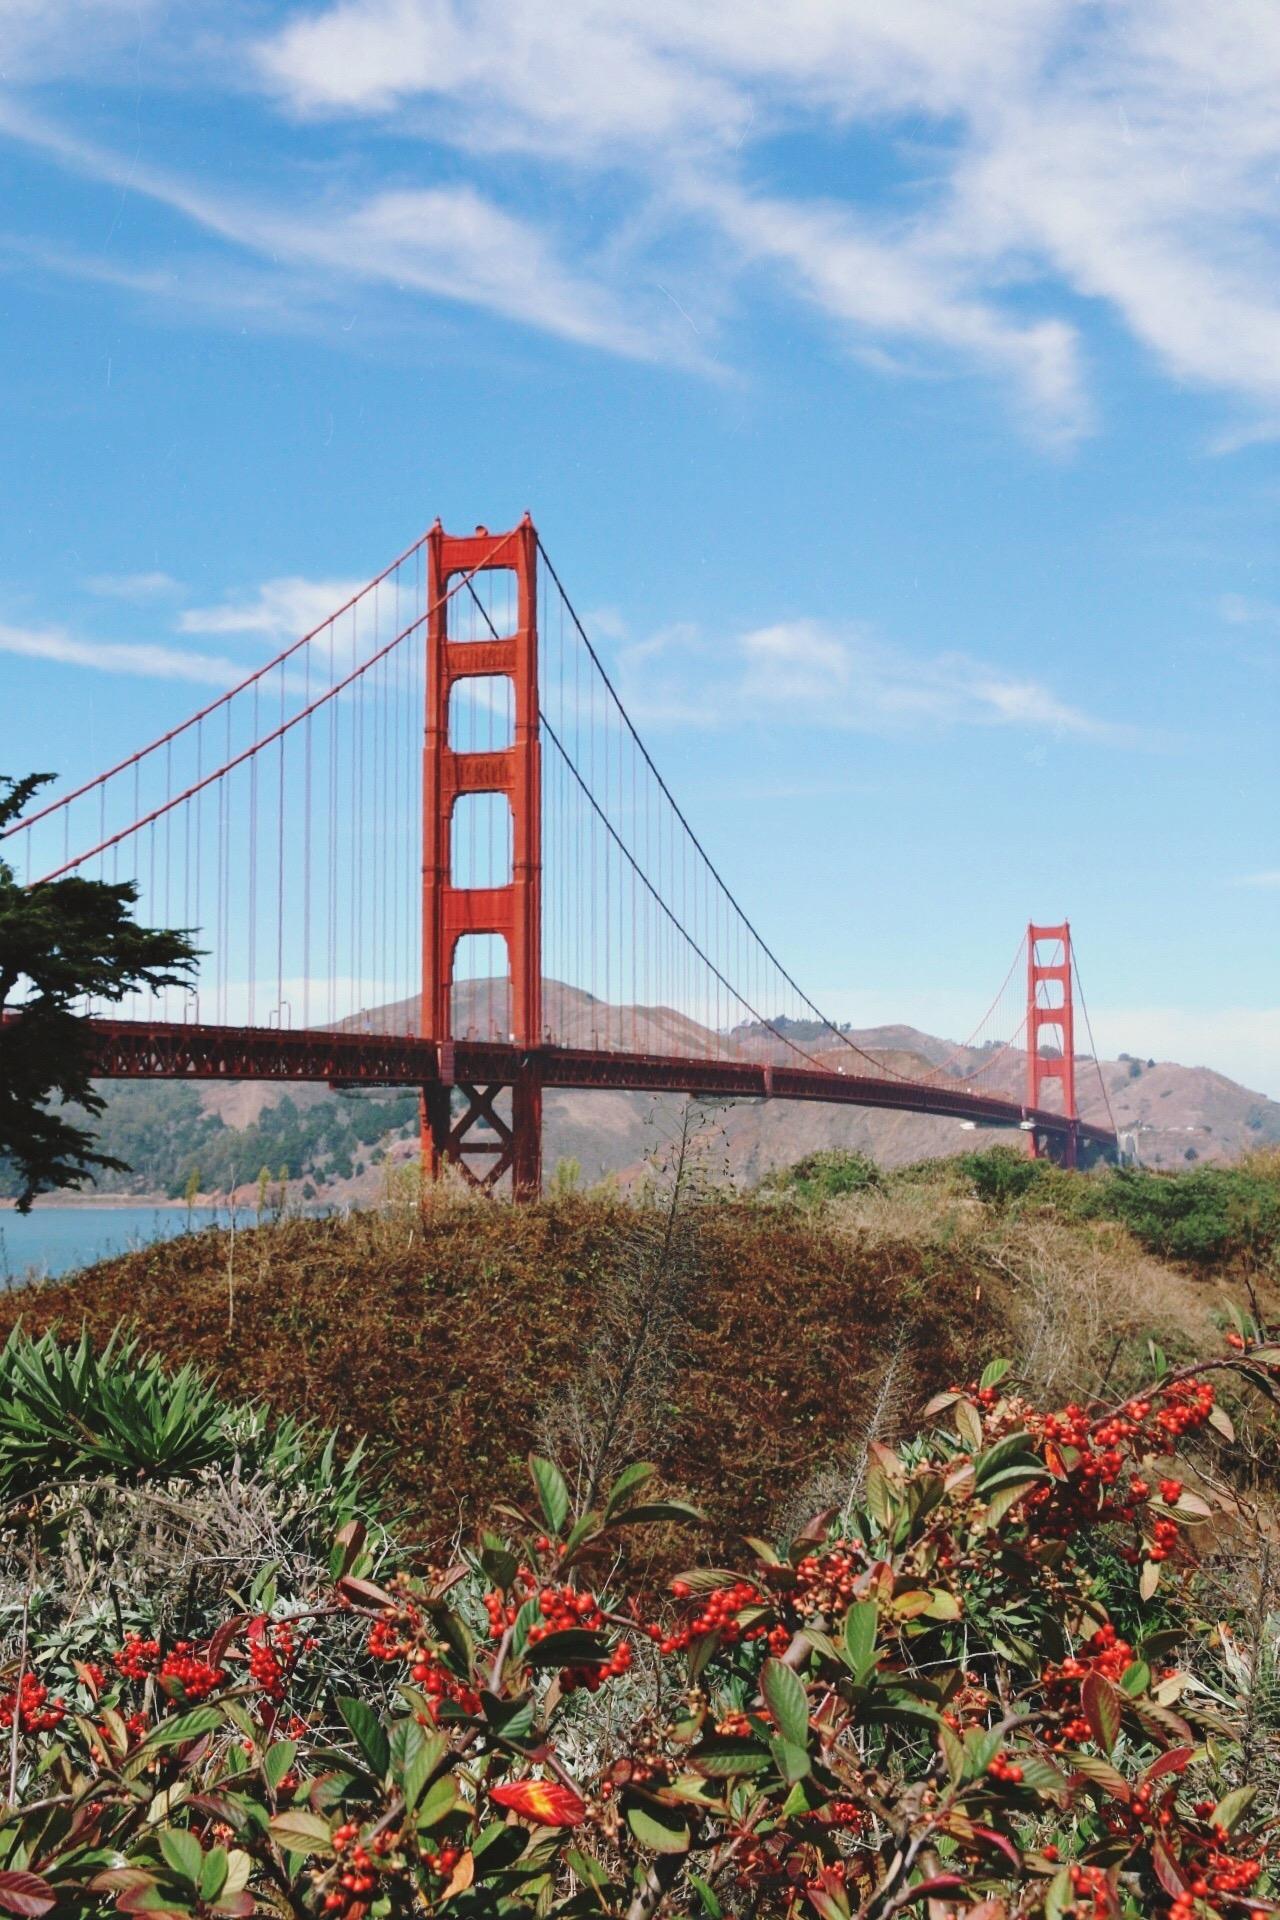 THE GOLDEN GATE BRIDGE - a bike ride over San Francisco's landmark #1